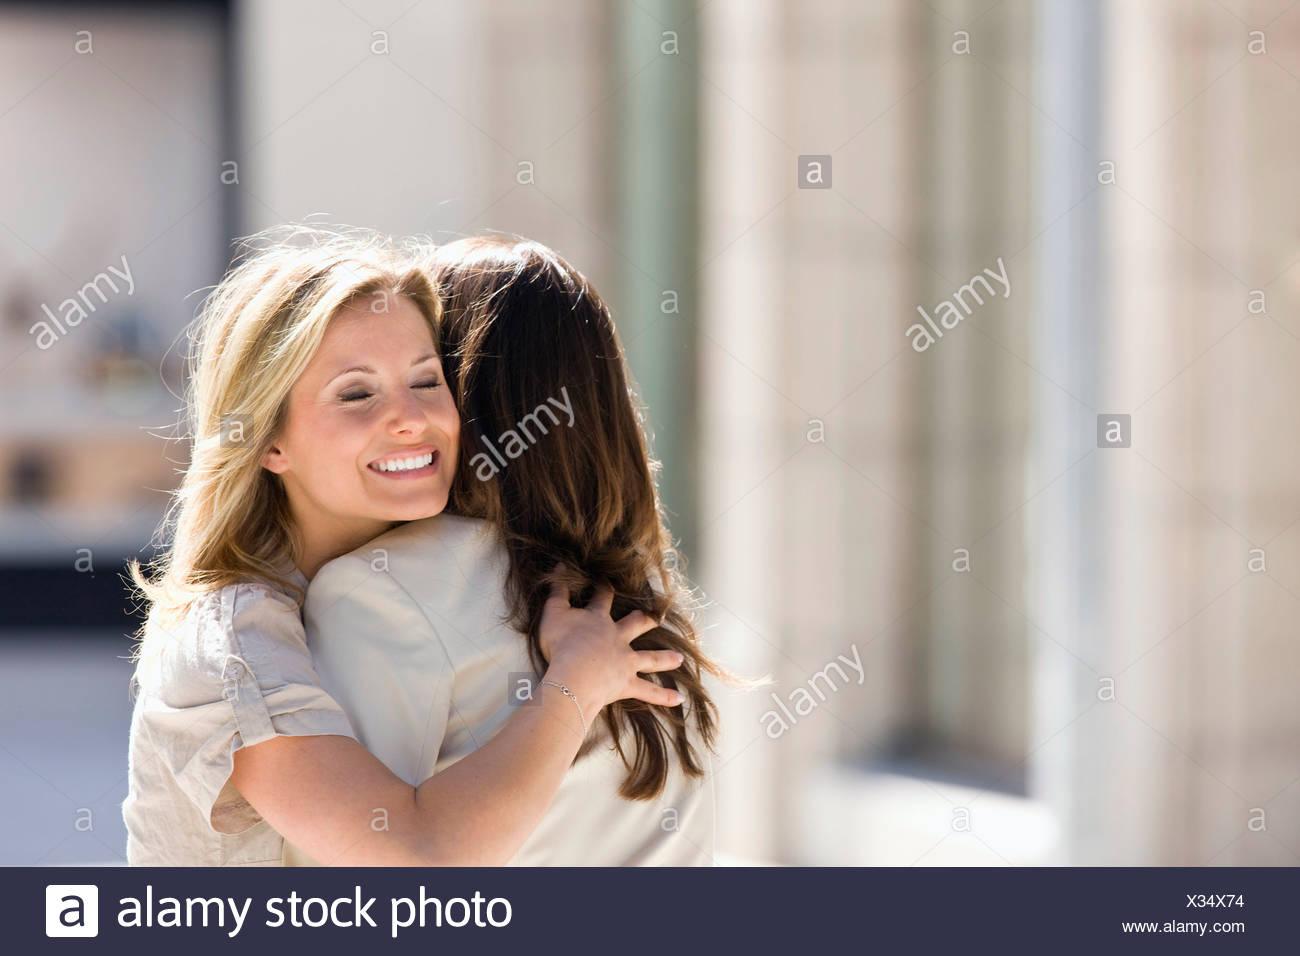 Dos mujeres abrazarse, Stuttgart, Baden-Wurtemberg, Alemania Foto de stock